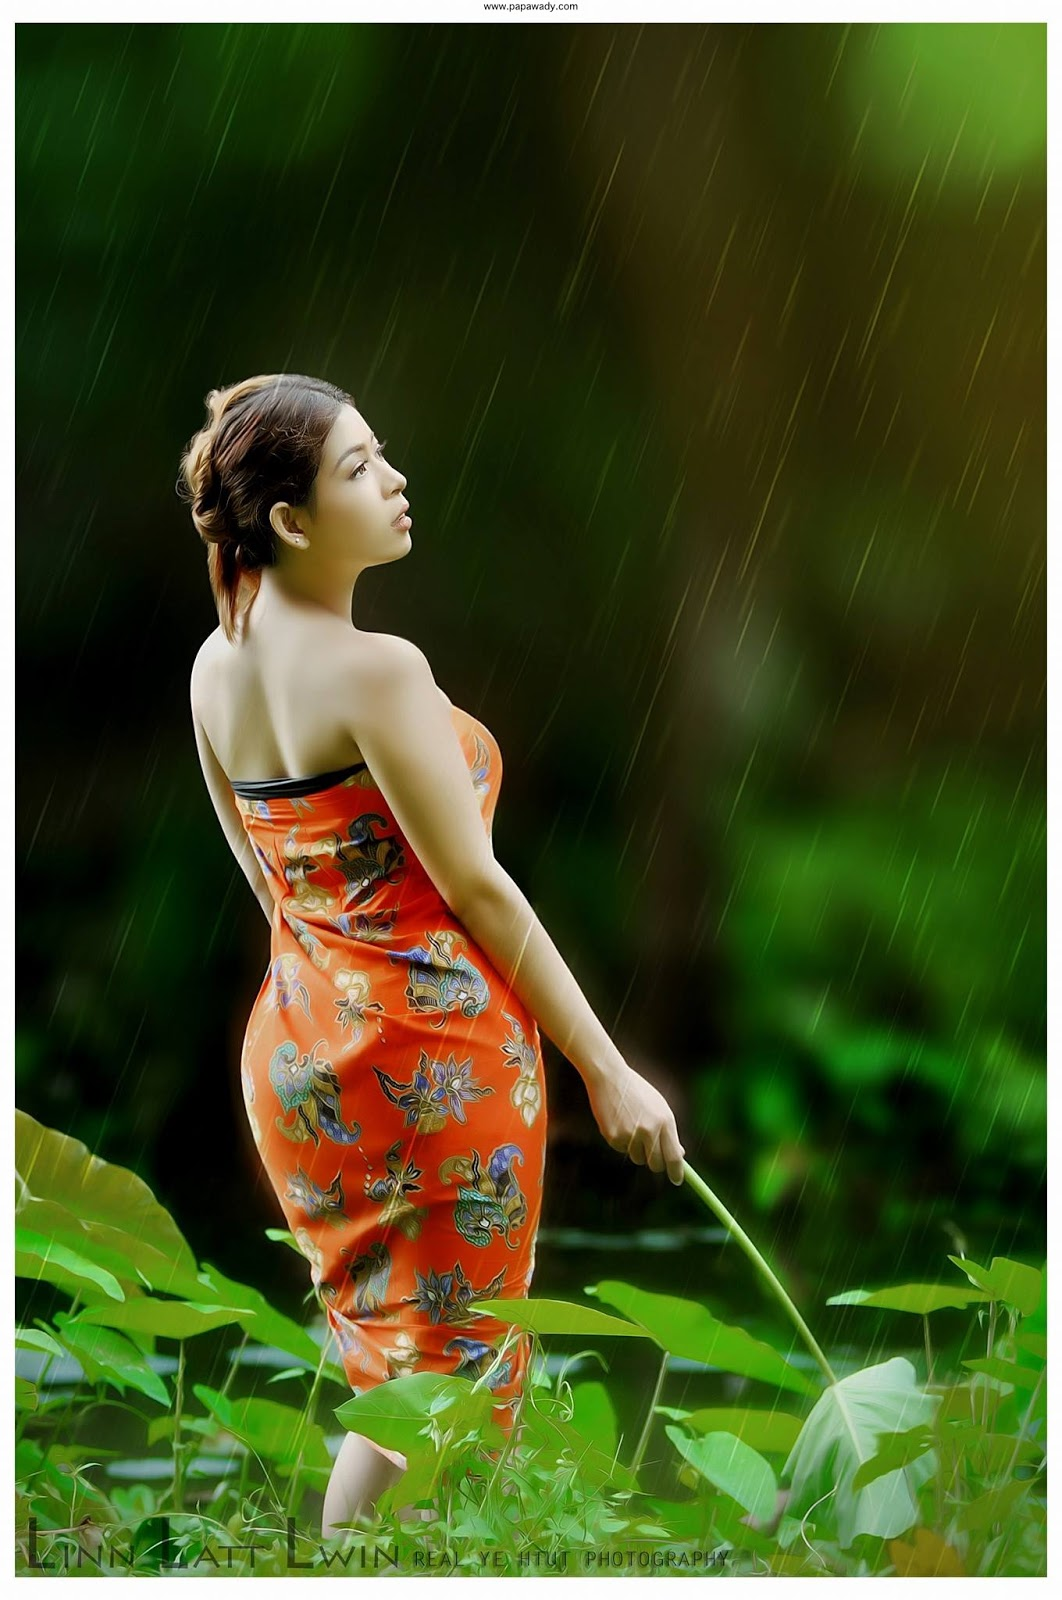 Lin Latt Lwin Outdoor Photoshoot Album 2